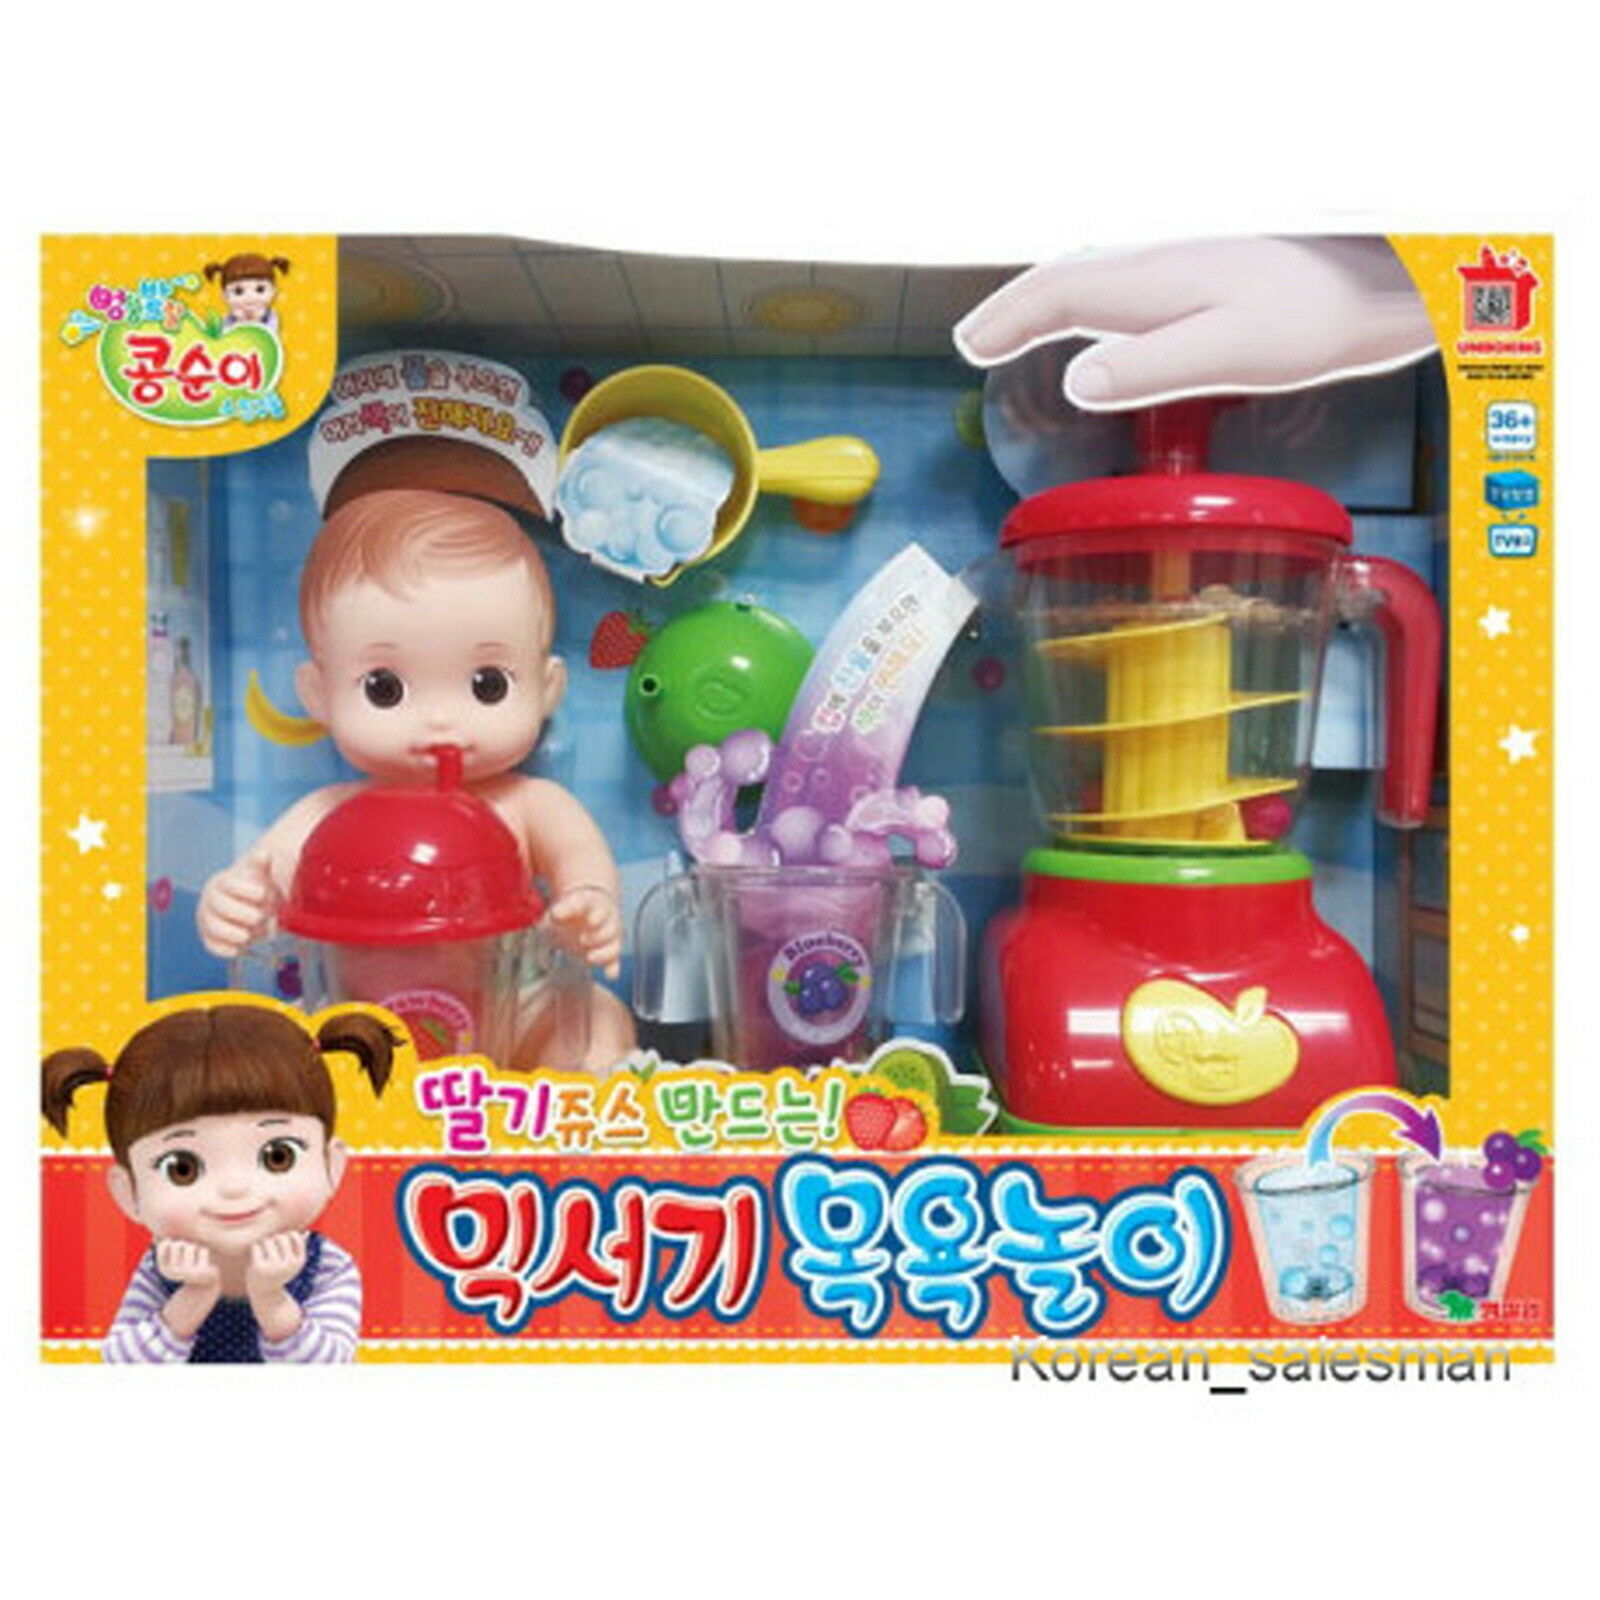 Kongsuni Mixer Bath Play Set/ Role Play Kids Toy Korean TV Character Kongkongi